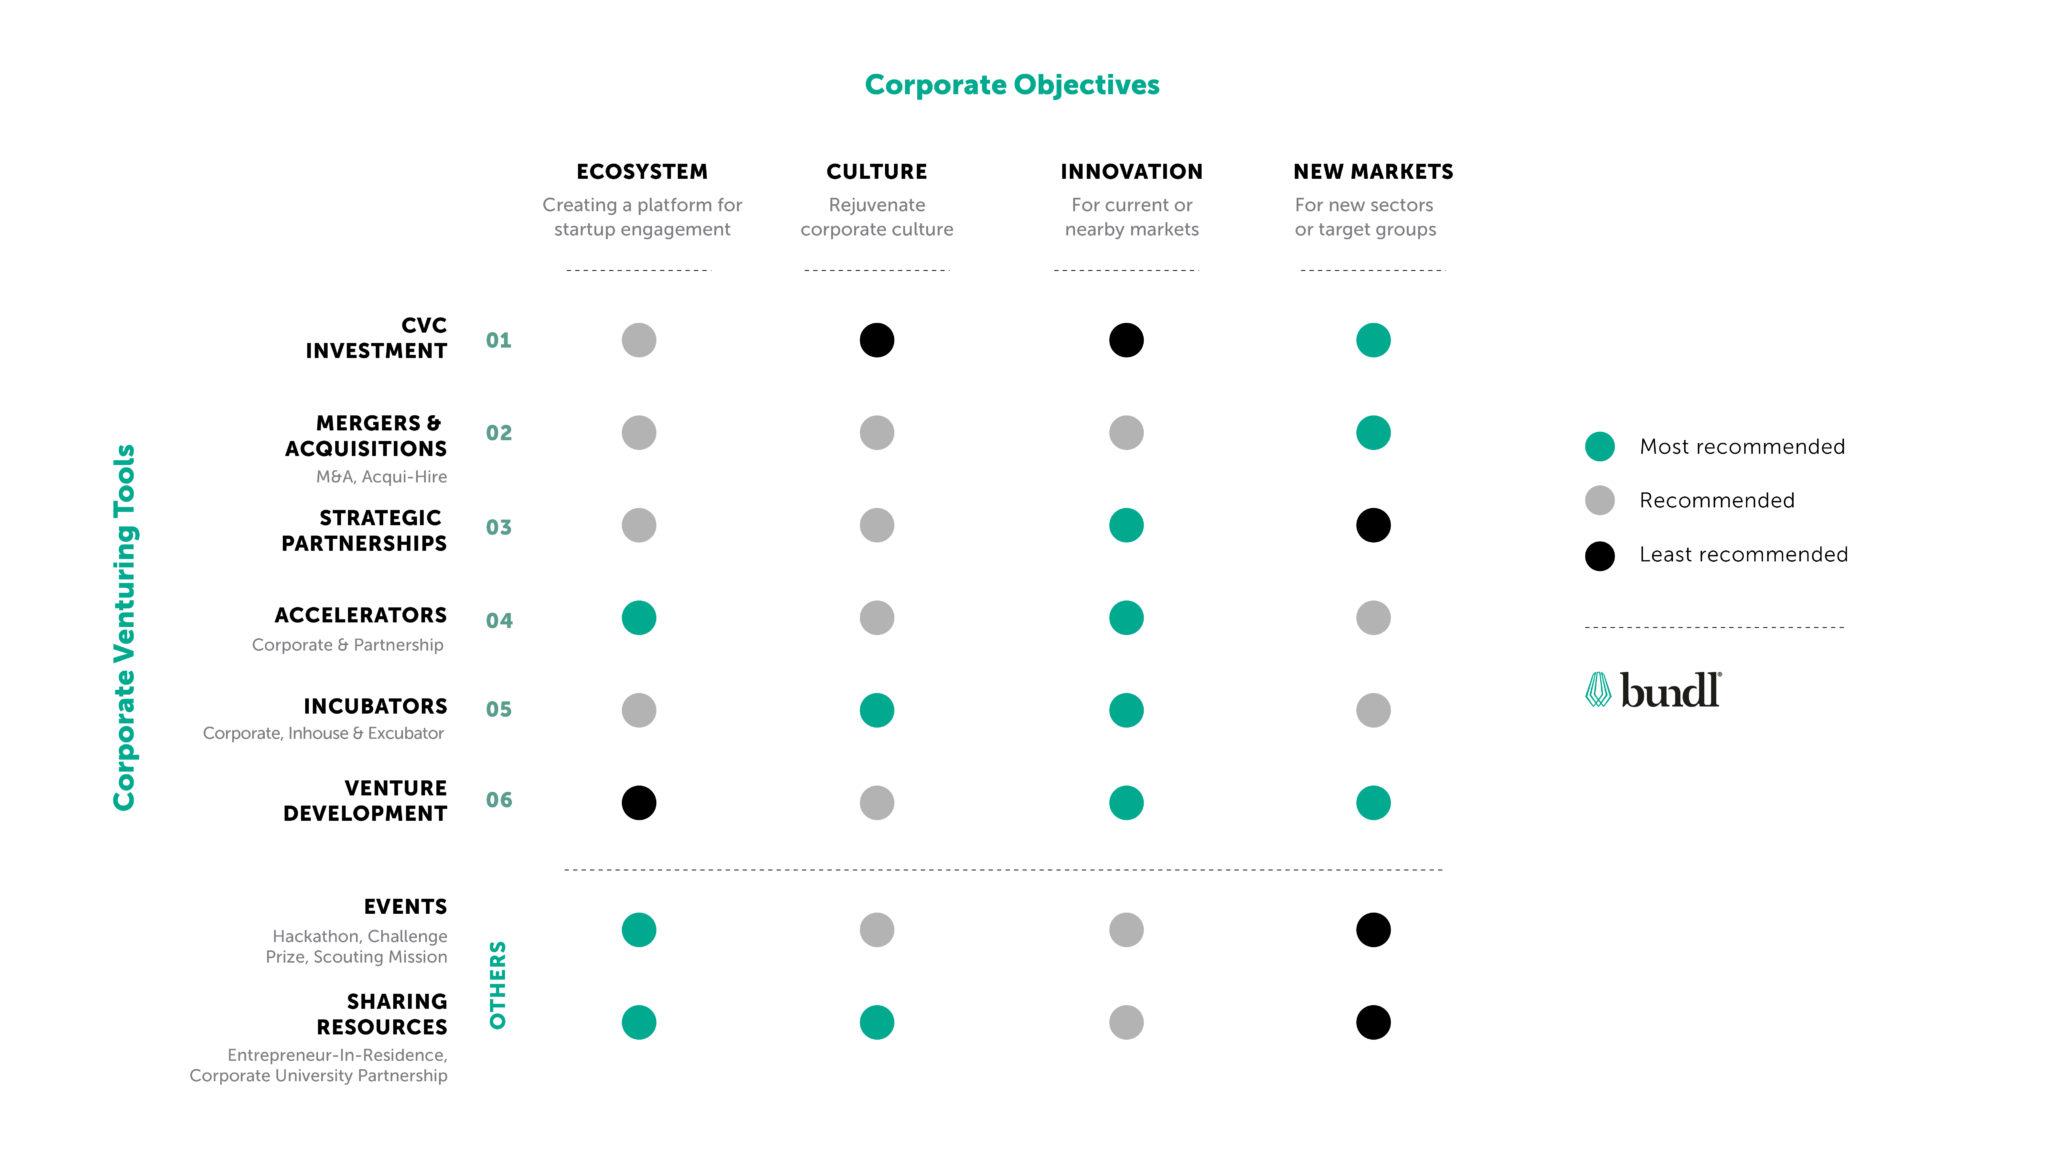 Bundl Corporate Objectives